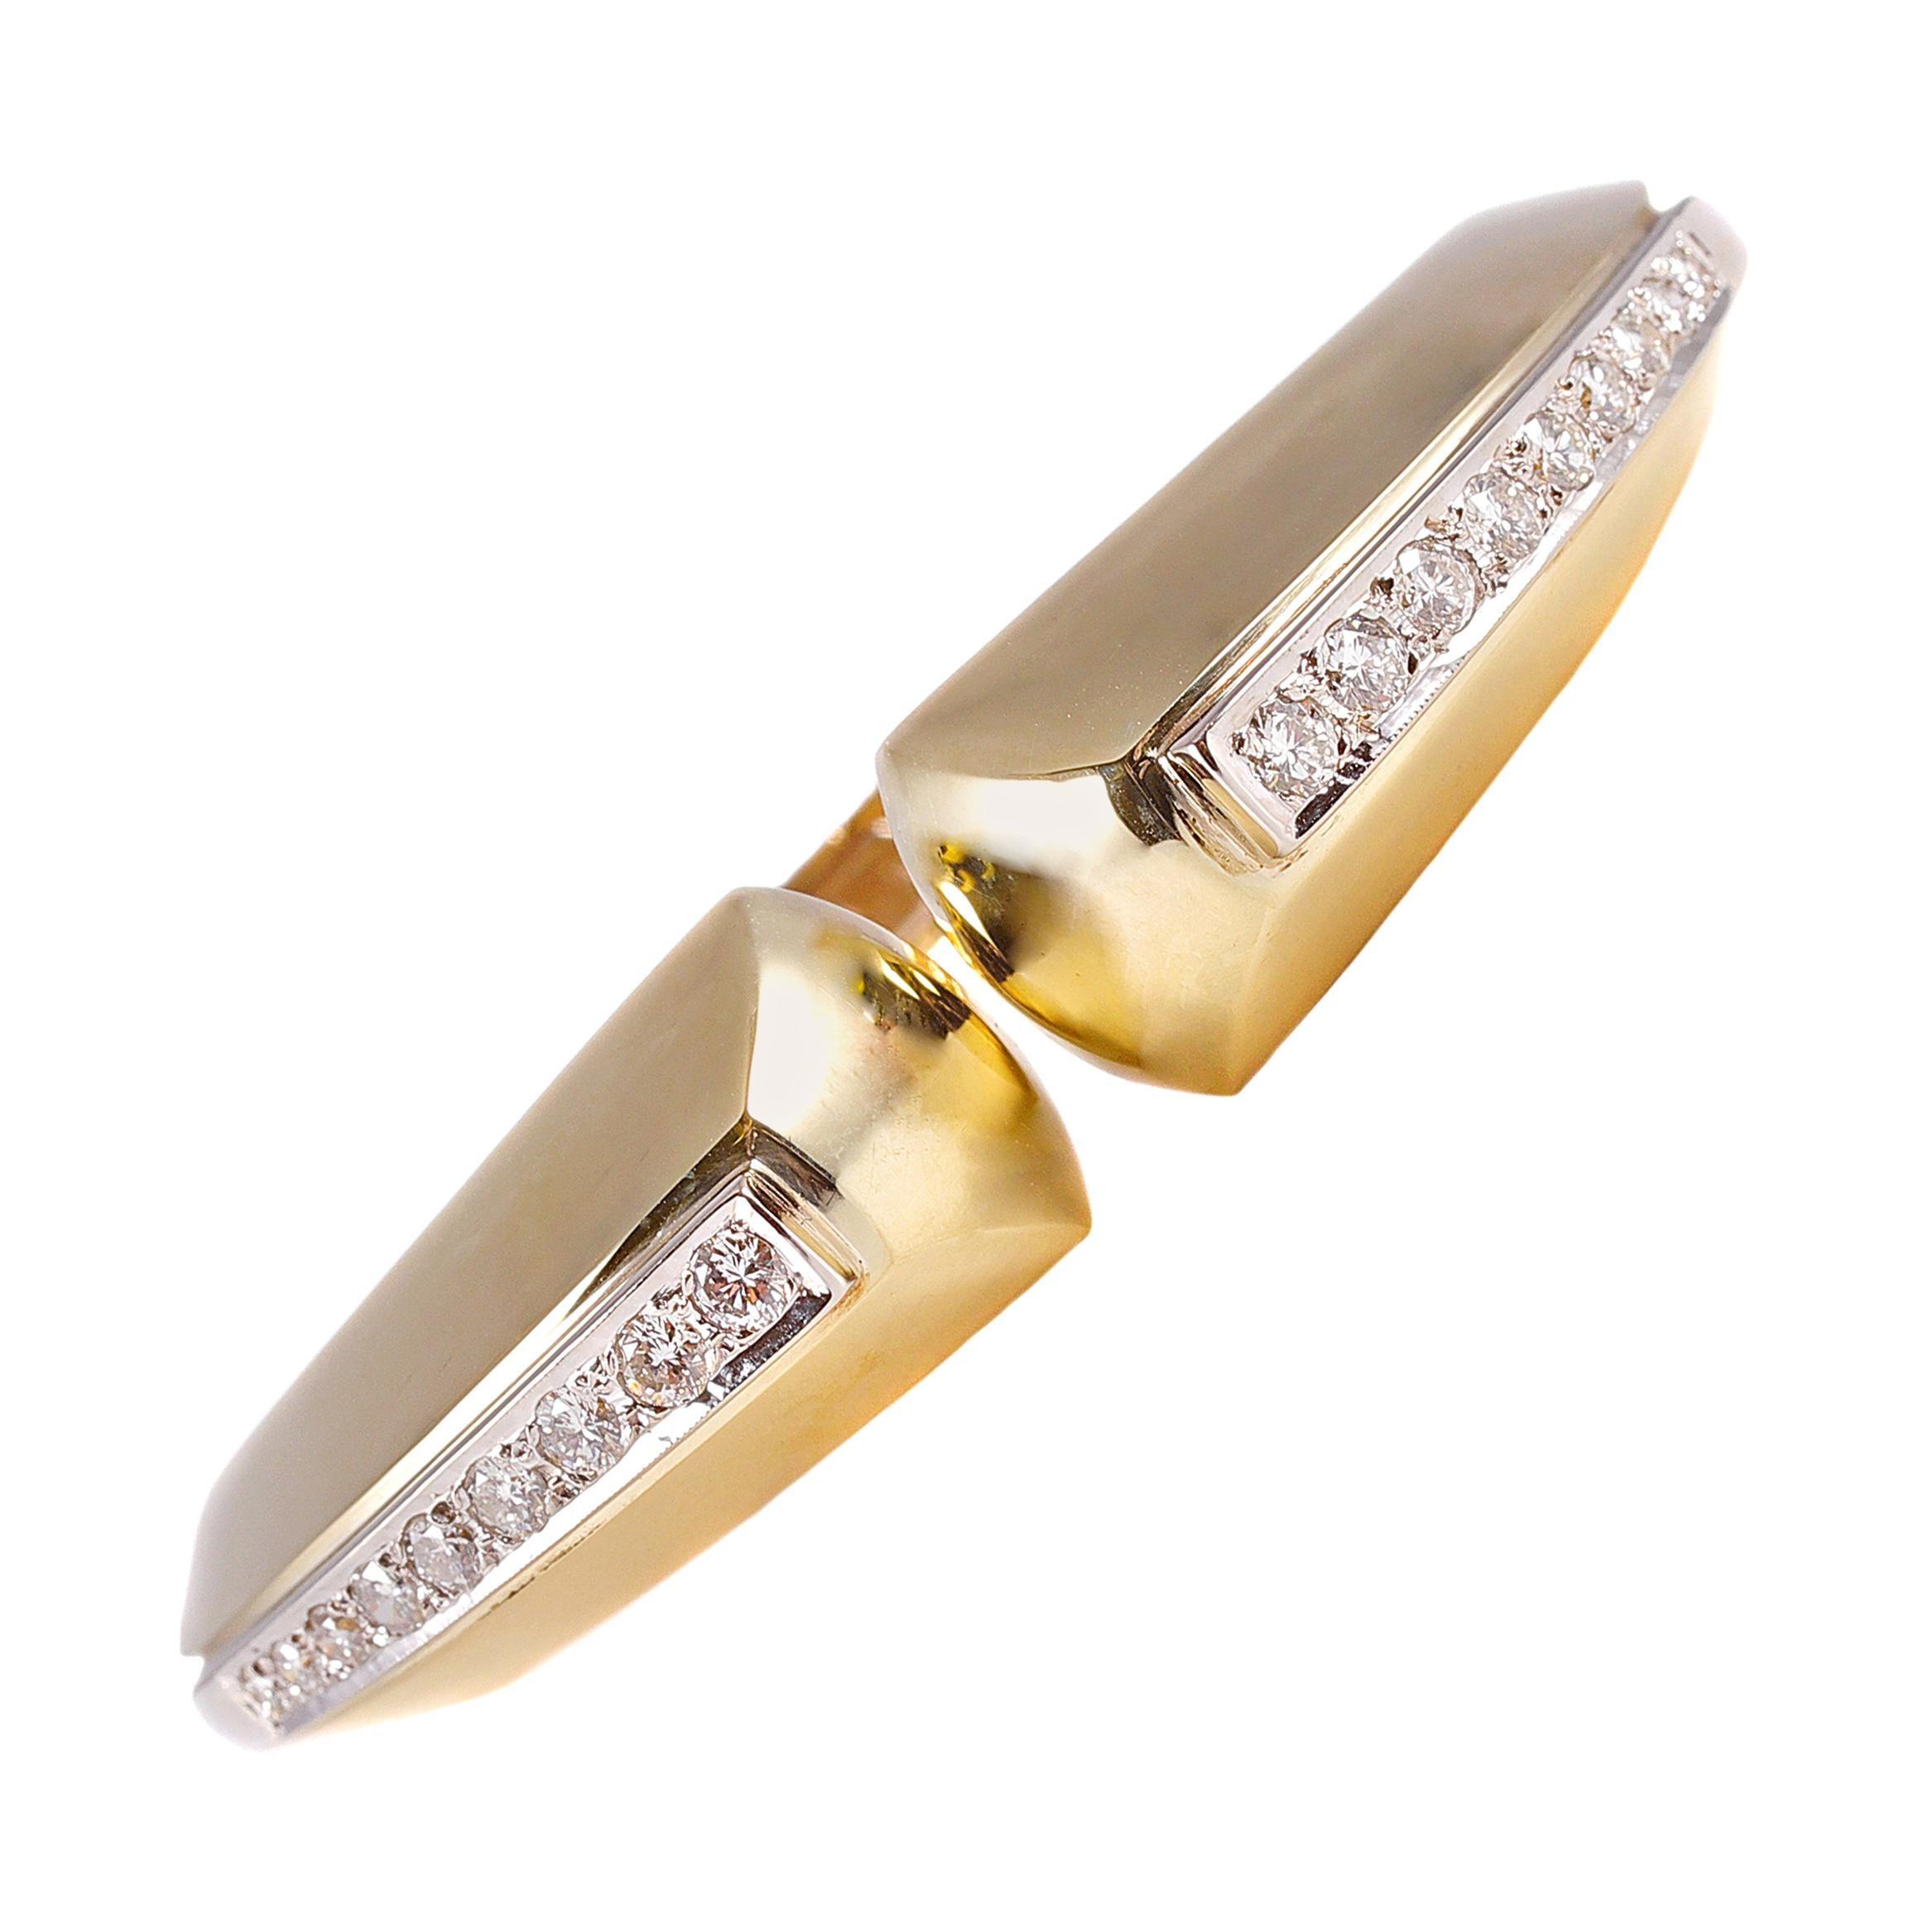 1.20 Carat Diamond Hinged Cuff Bracelet in 14 Karat Gold